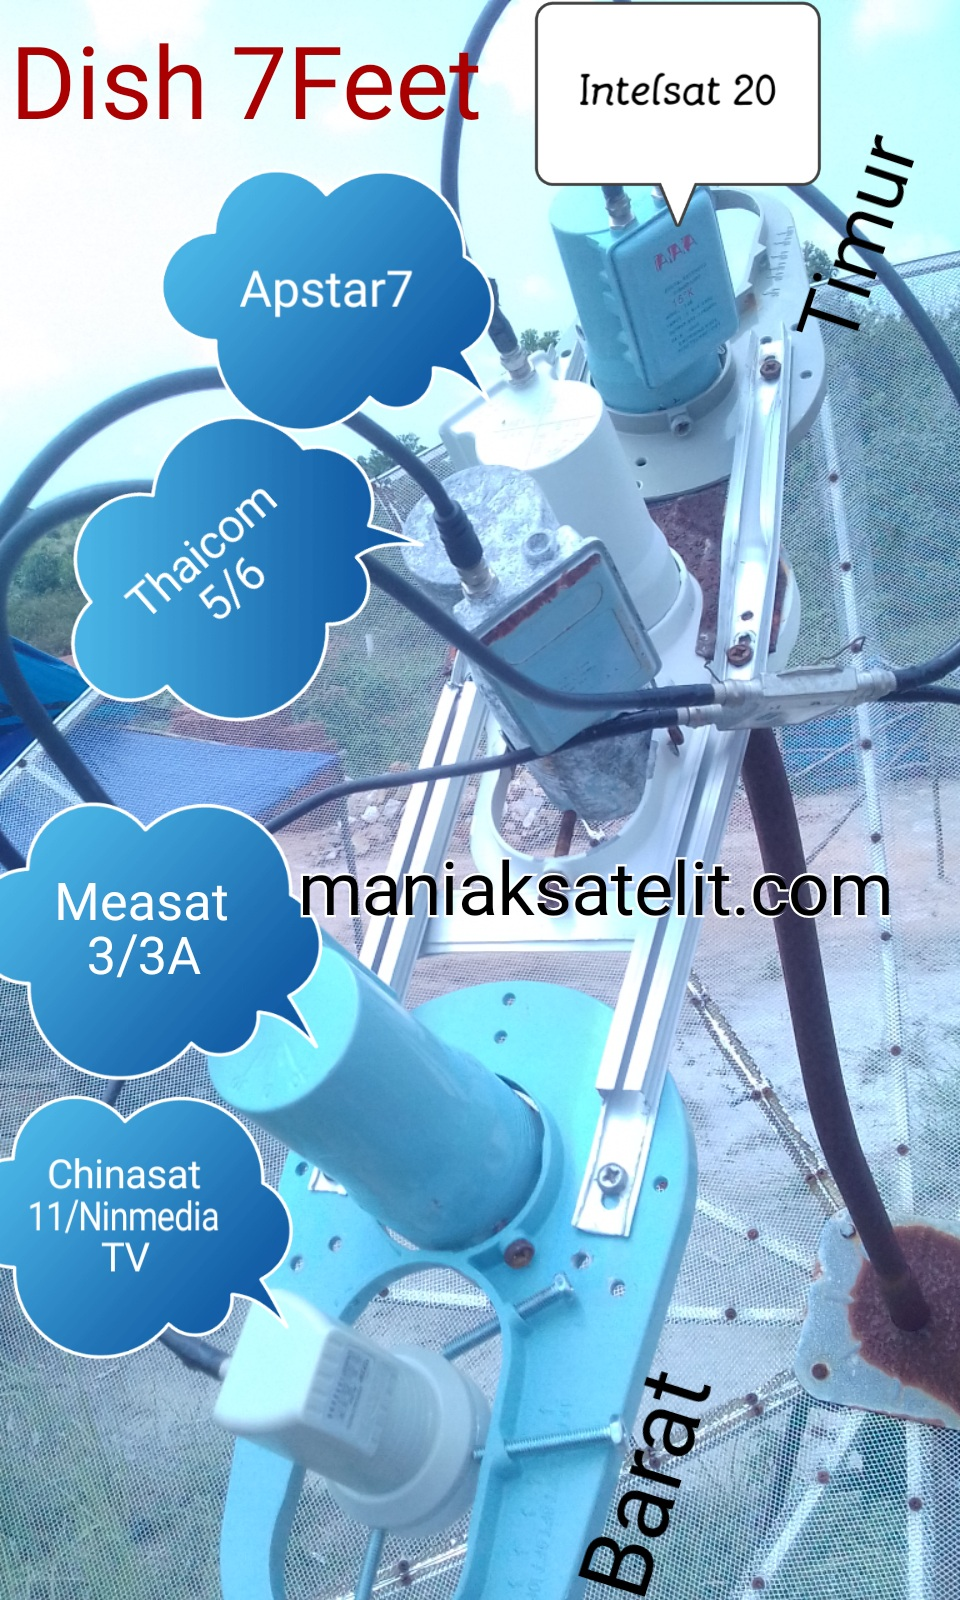 Eksperimen Menggabungkan Satelit/LNB Intelsat20-Apstar7-Thaicom5/6-Measat 3A- dan Chinasat 11 (Ninmedia TV).